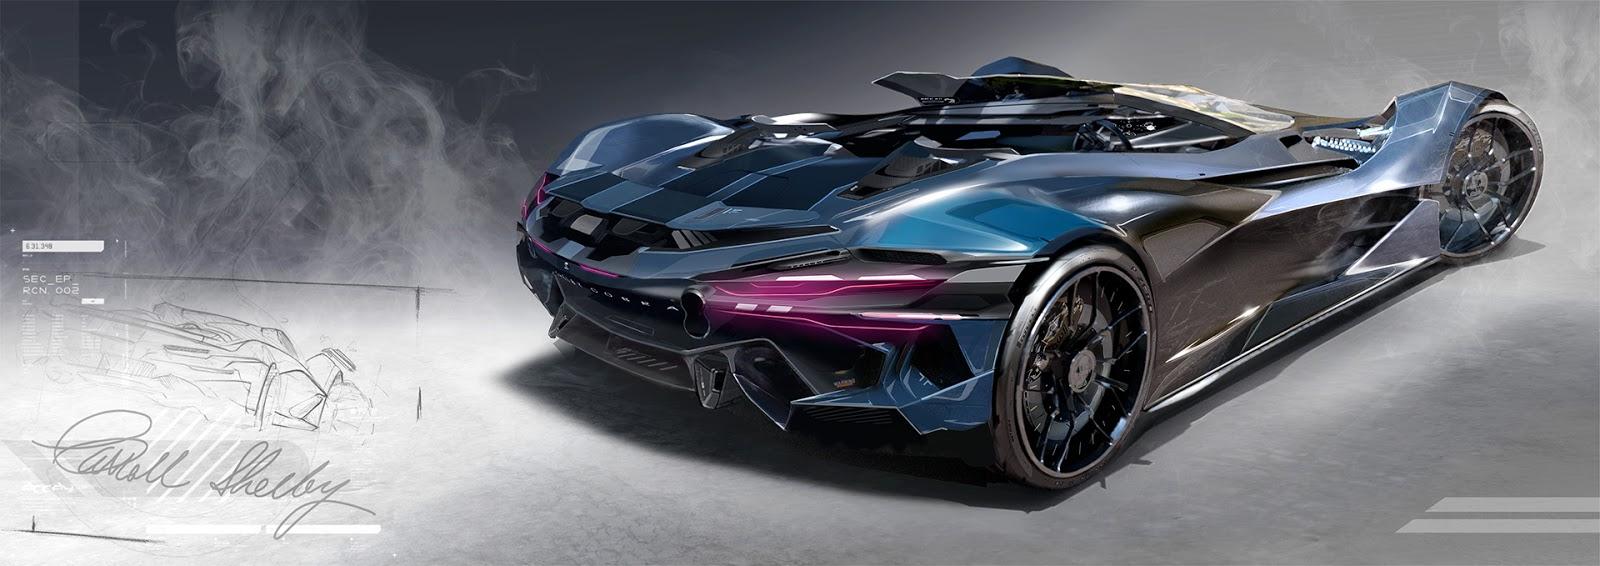 shelby-cobra-hypercar-concept-_soymotor_3.jpg